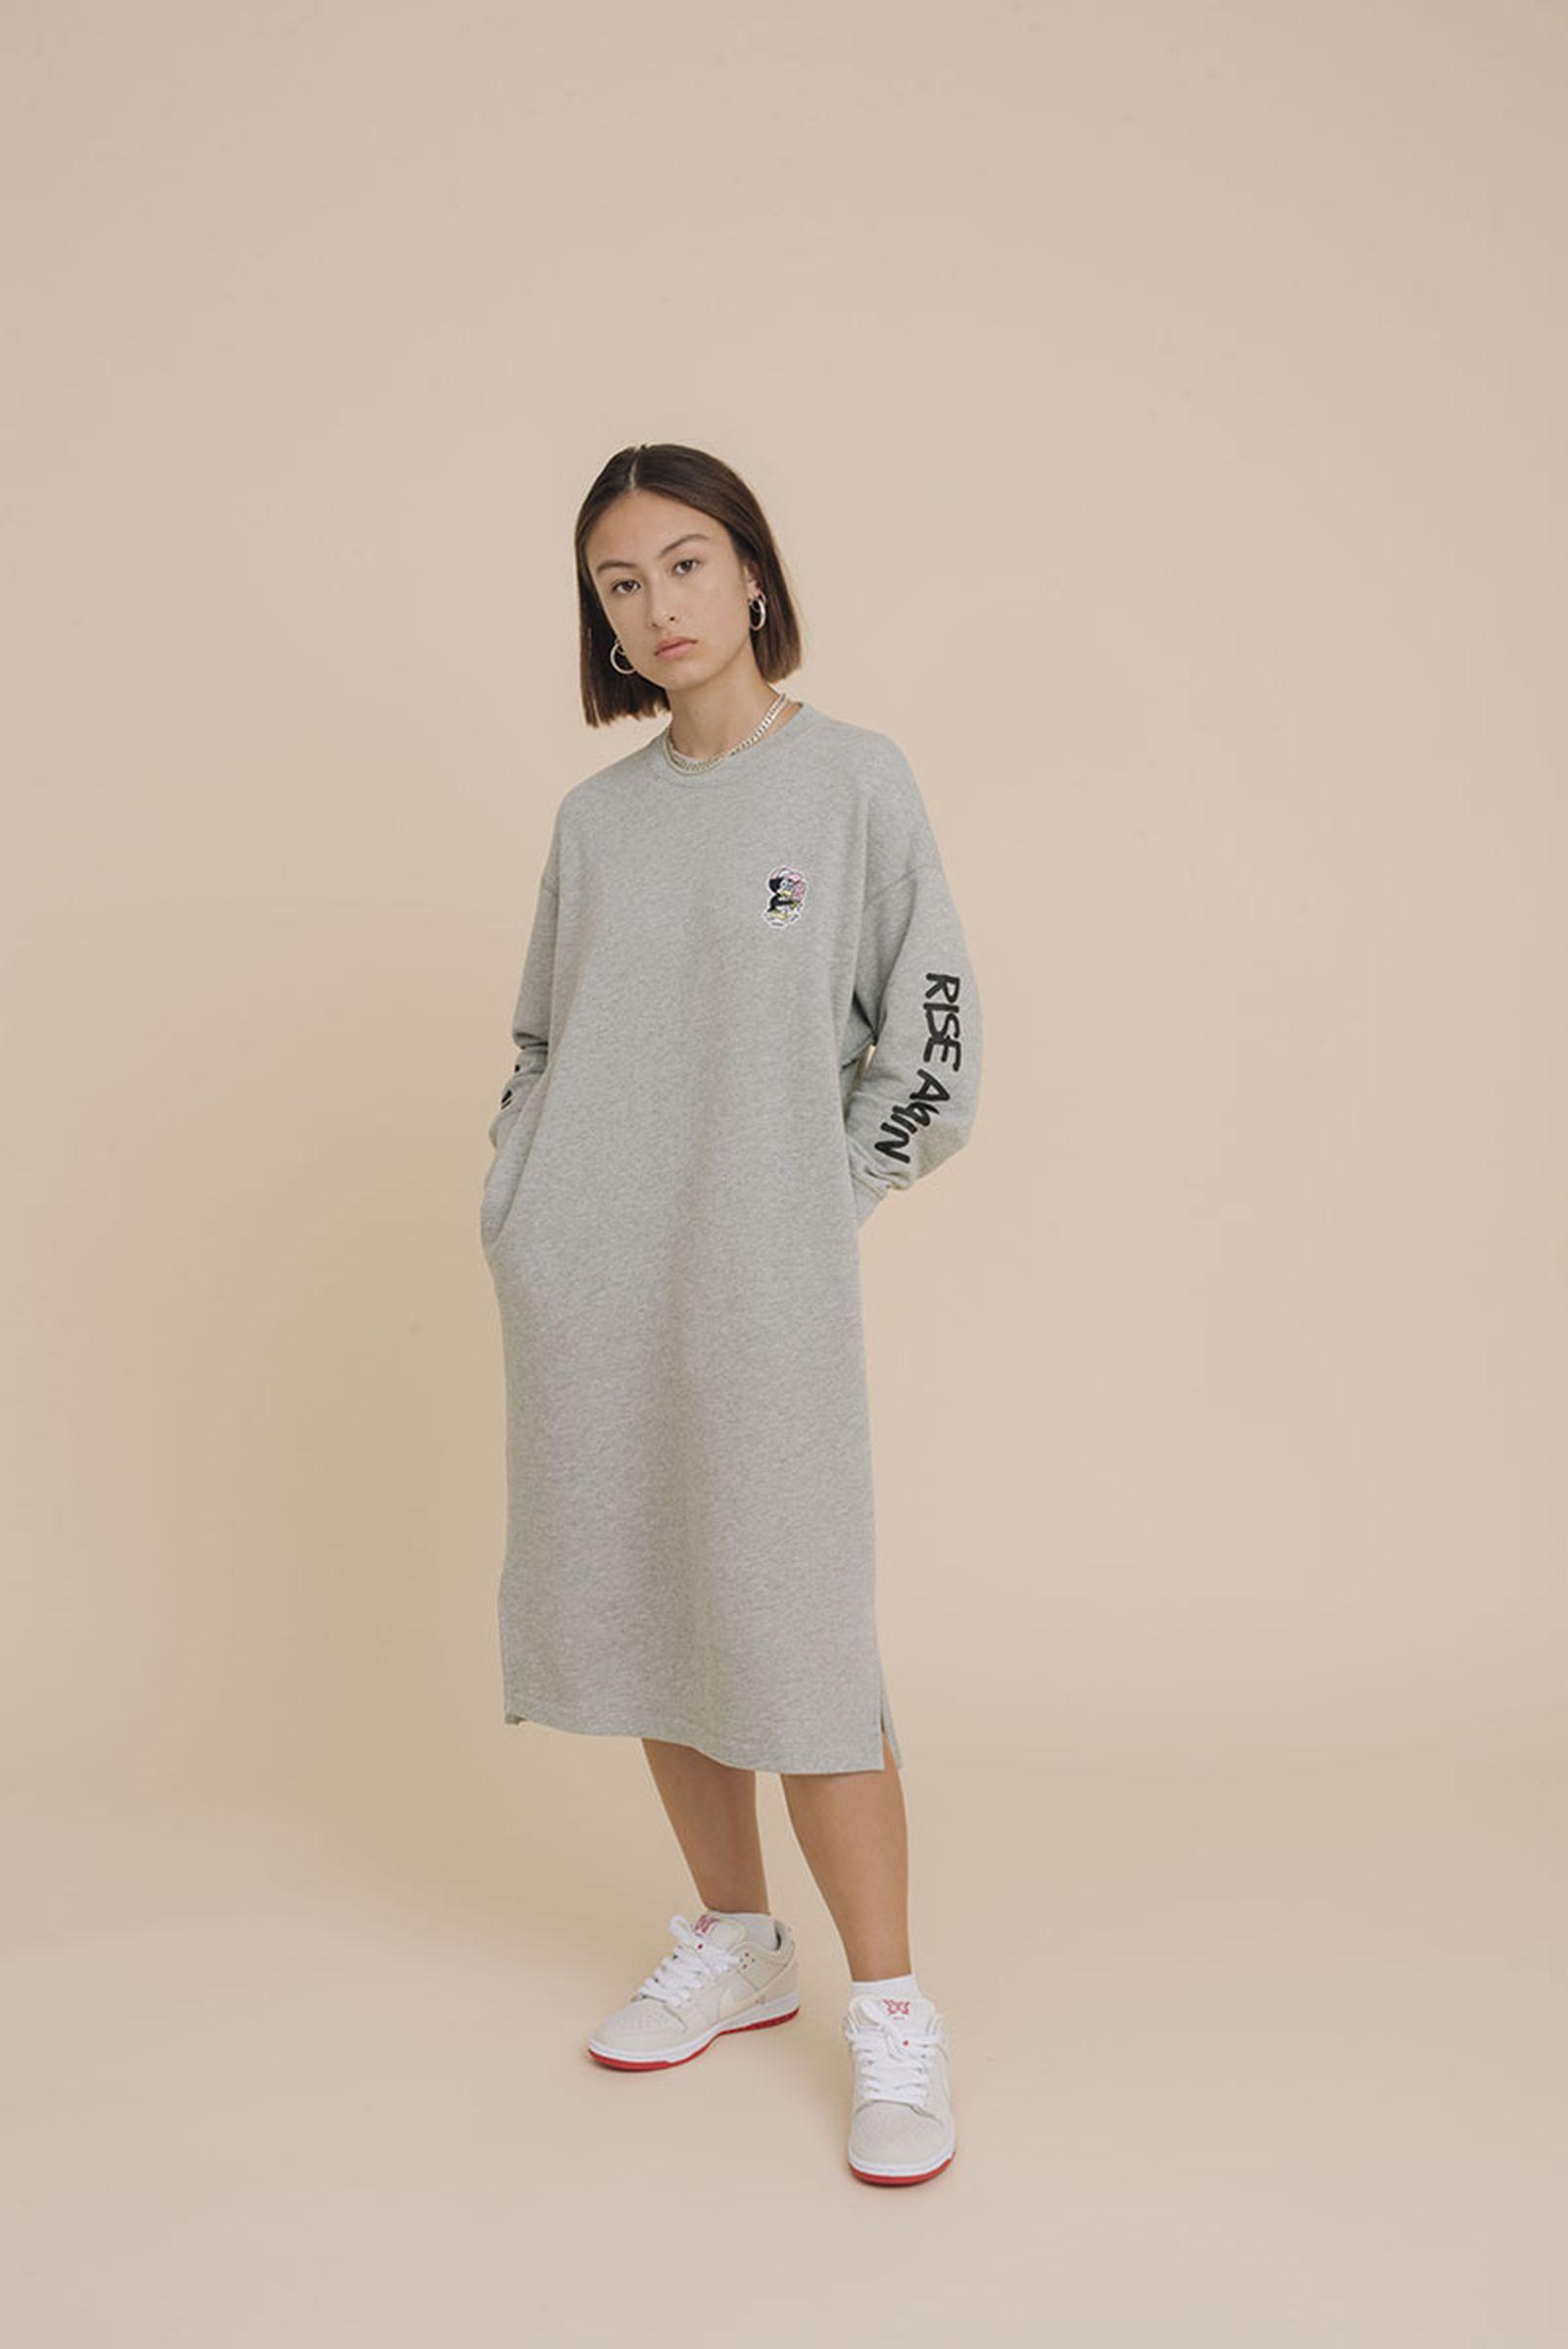 Uniqlo Verdy FW19 grey dress